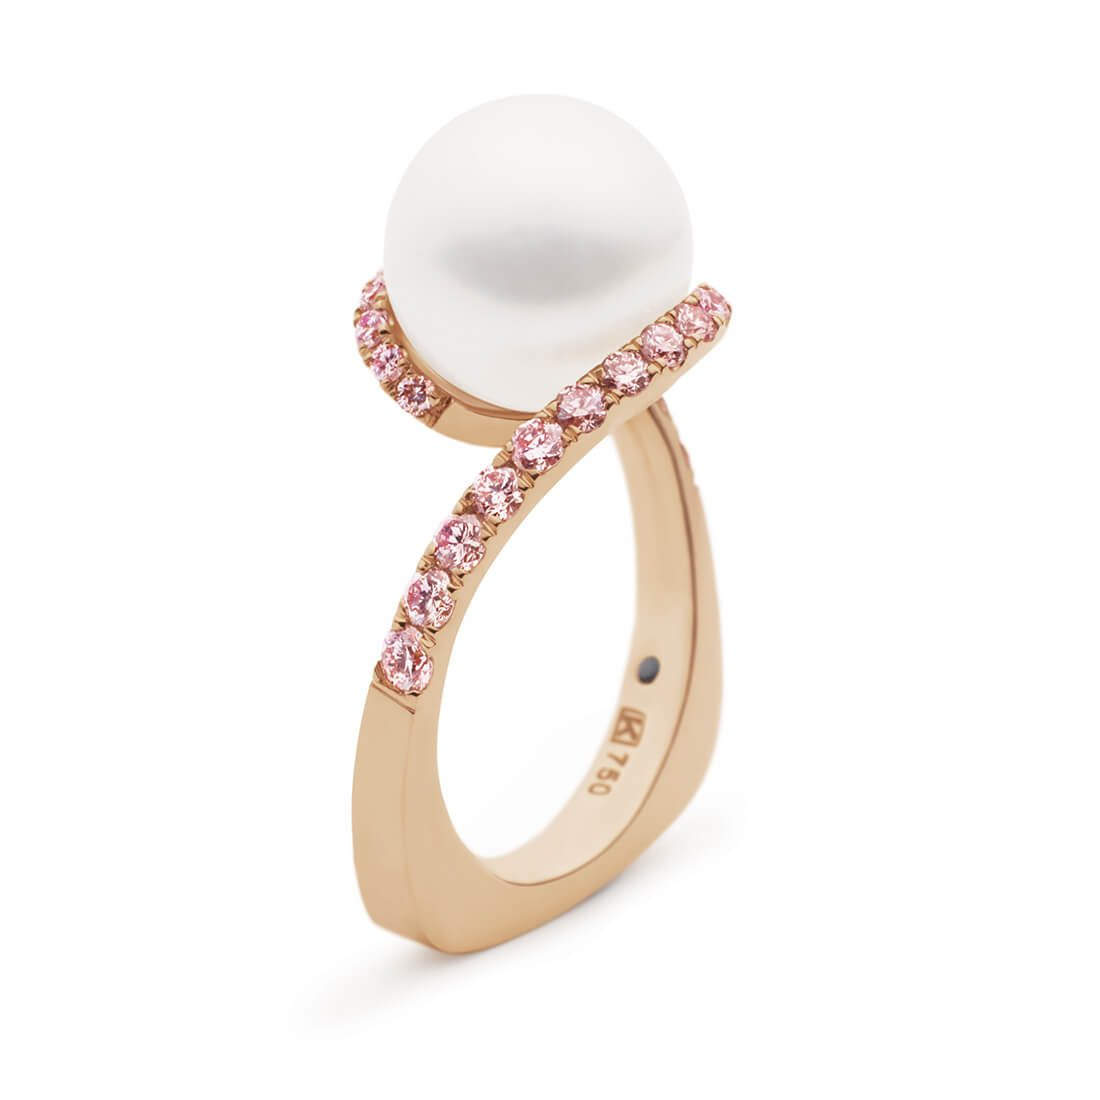 Angelic Ring, Rose